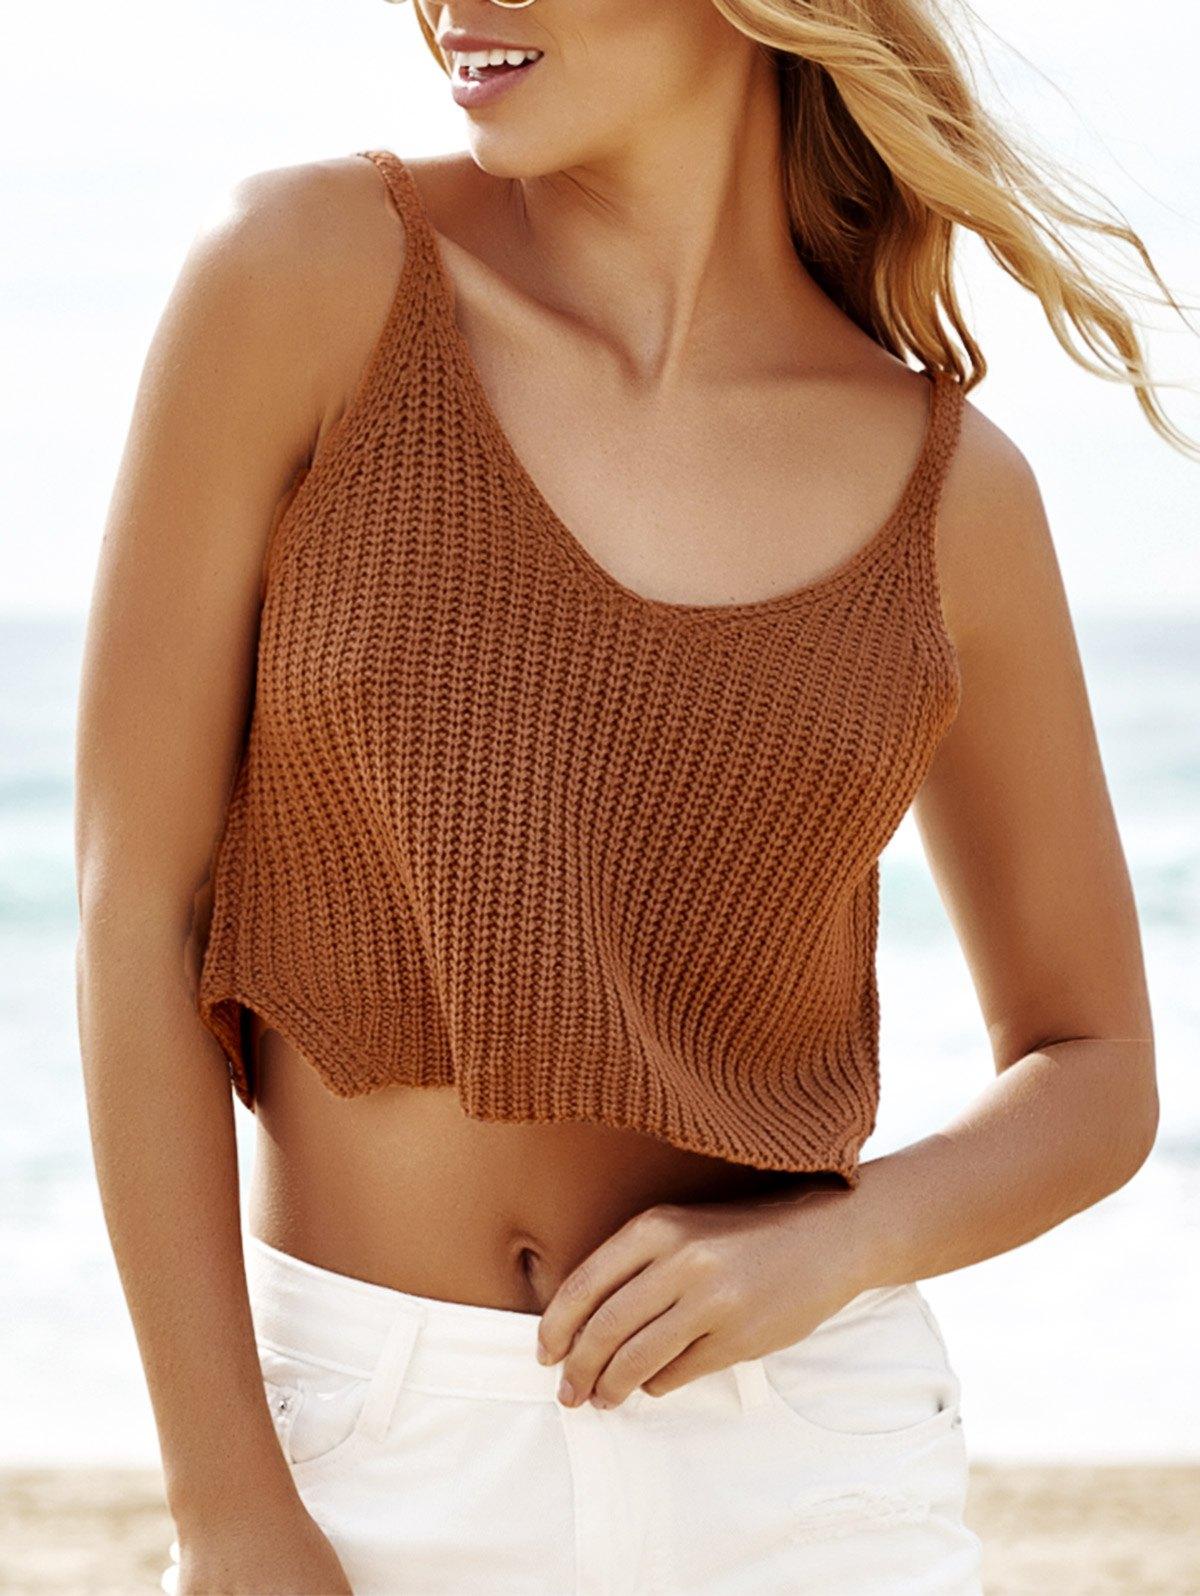 Scoop Neck Sleeveless Khaki Knit Crop Top